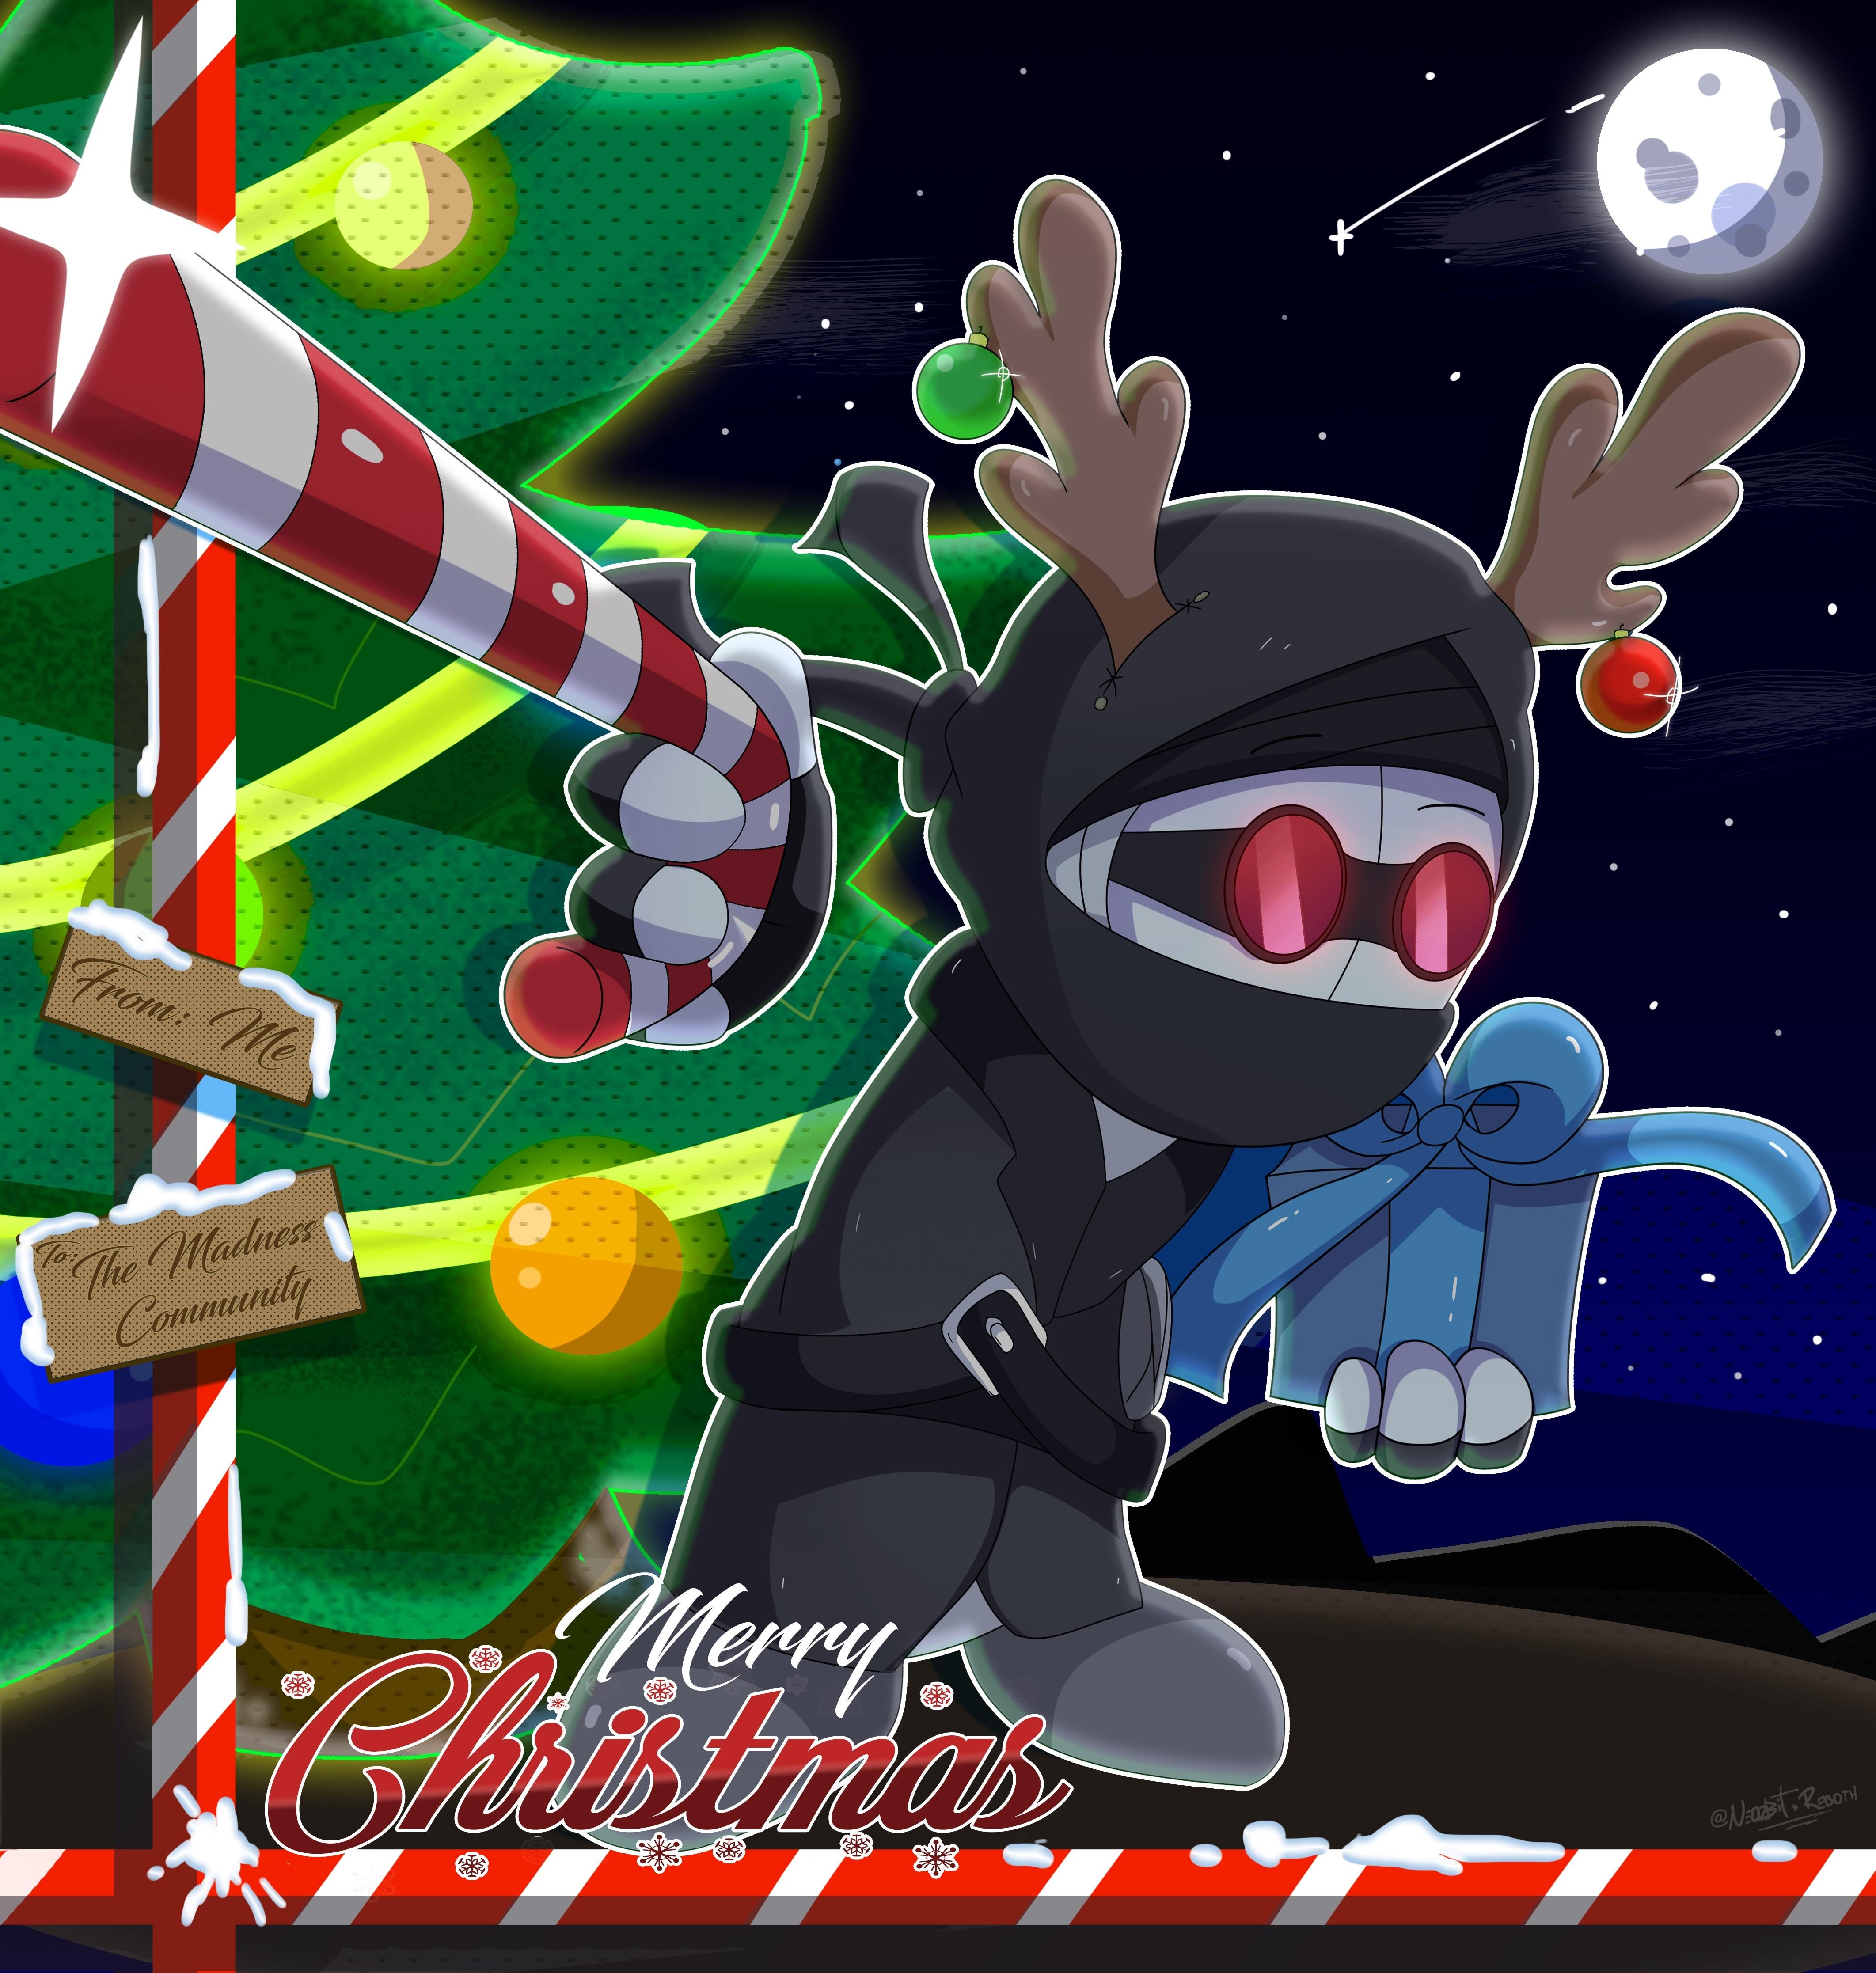 Happy Christmas Community - 2018